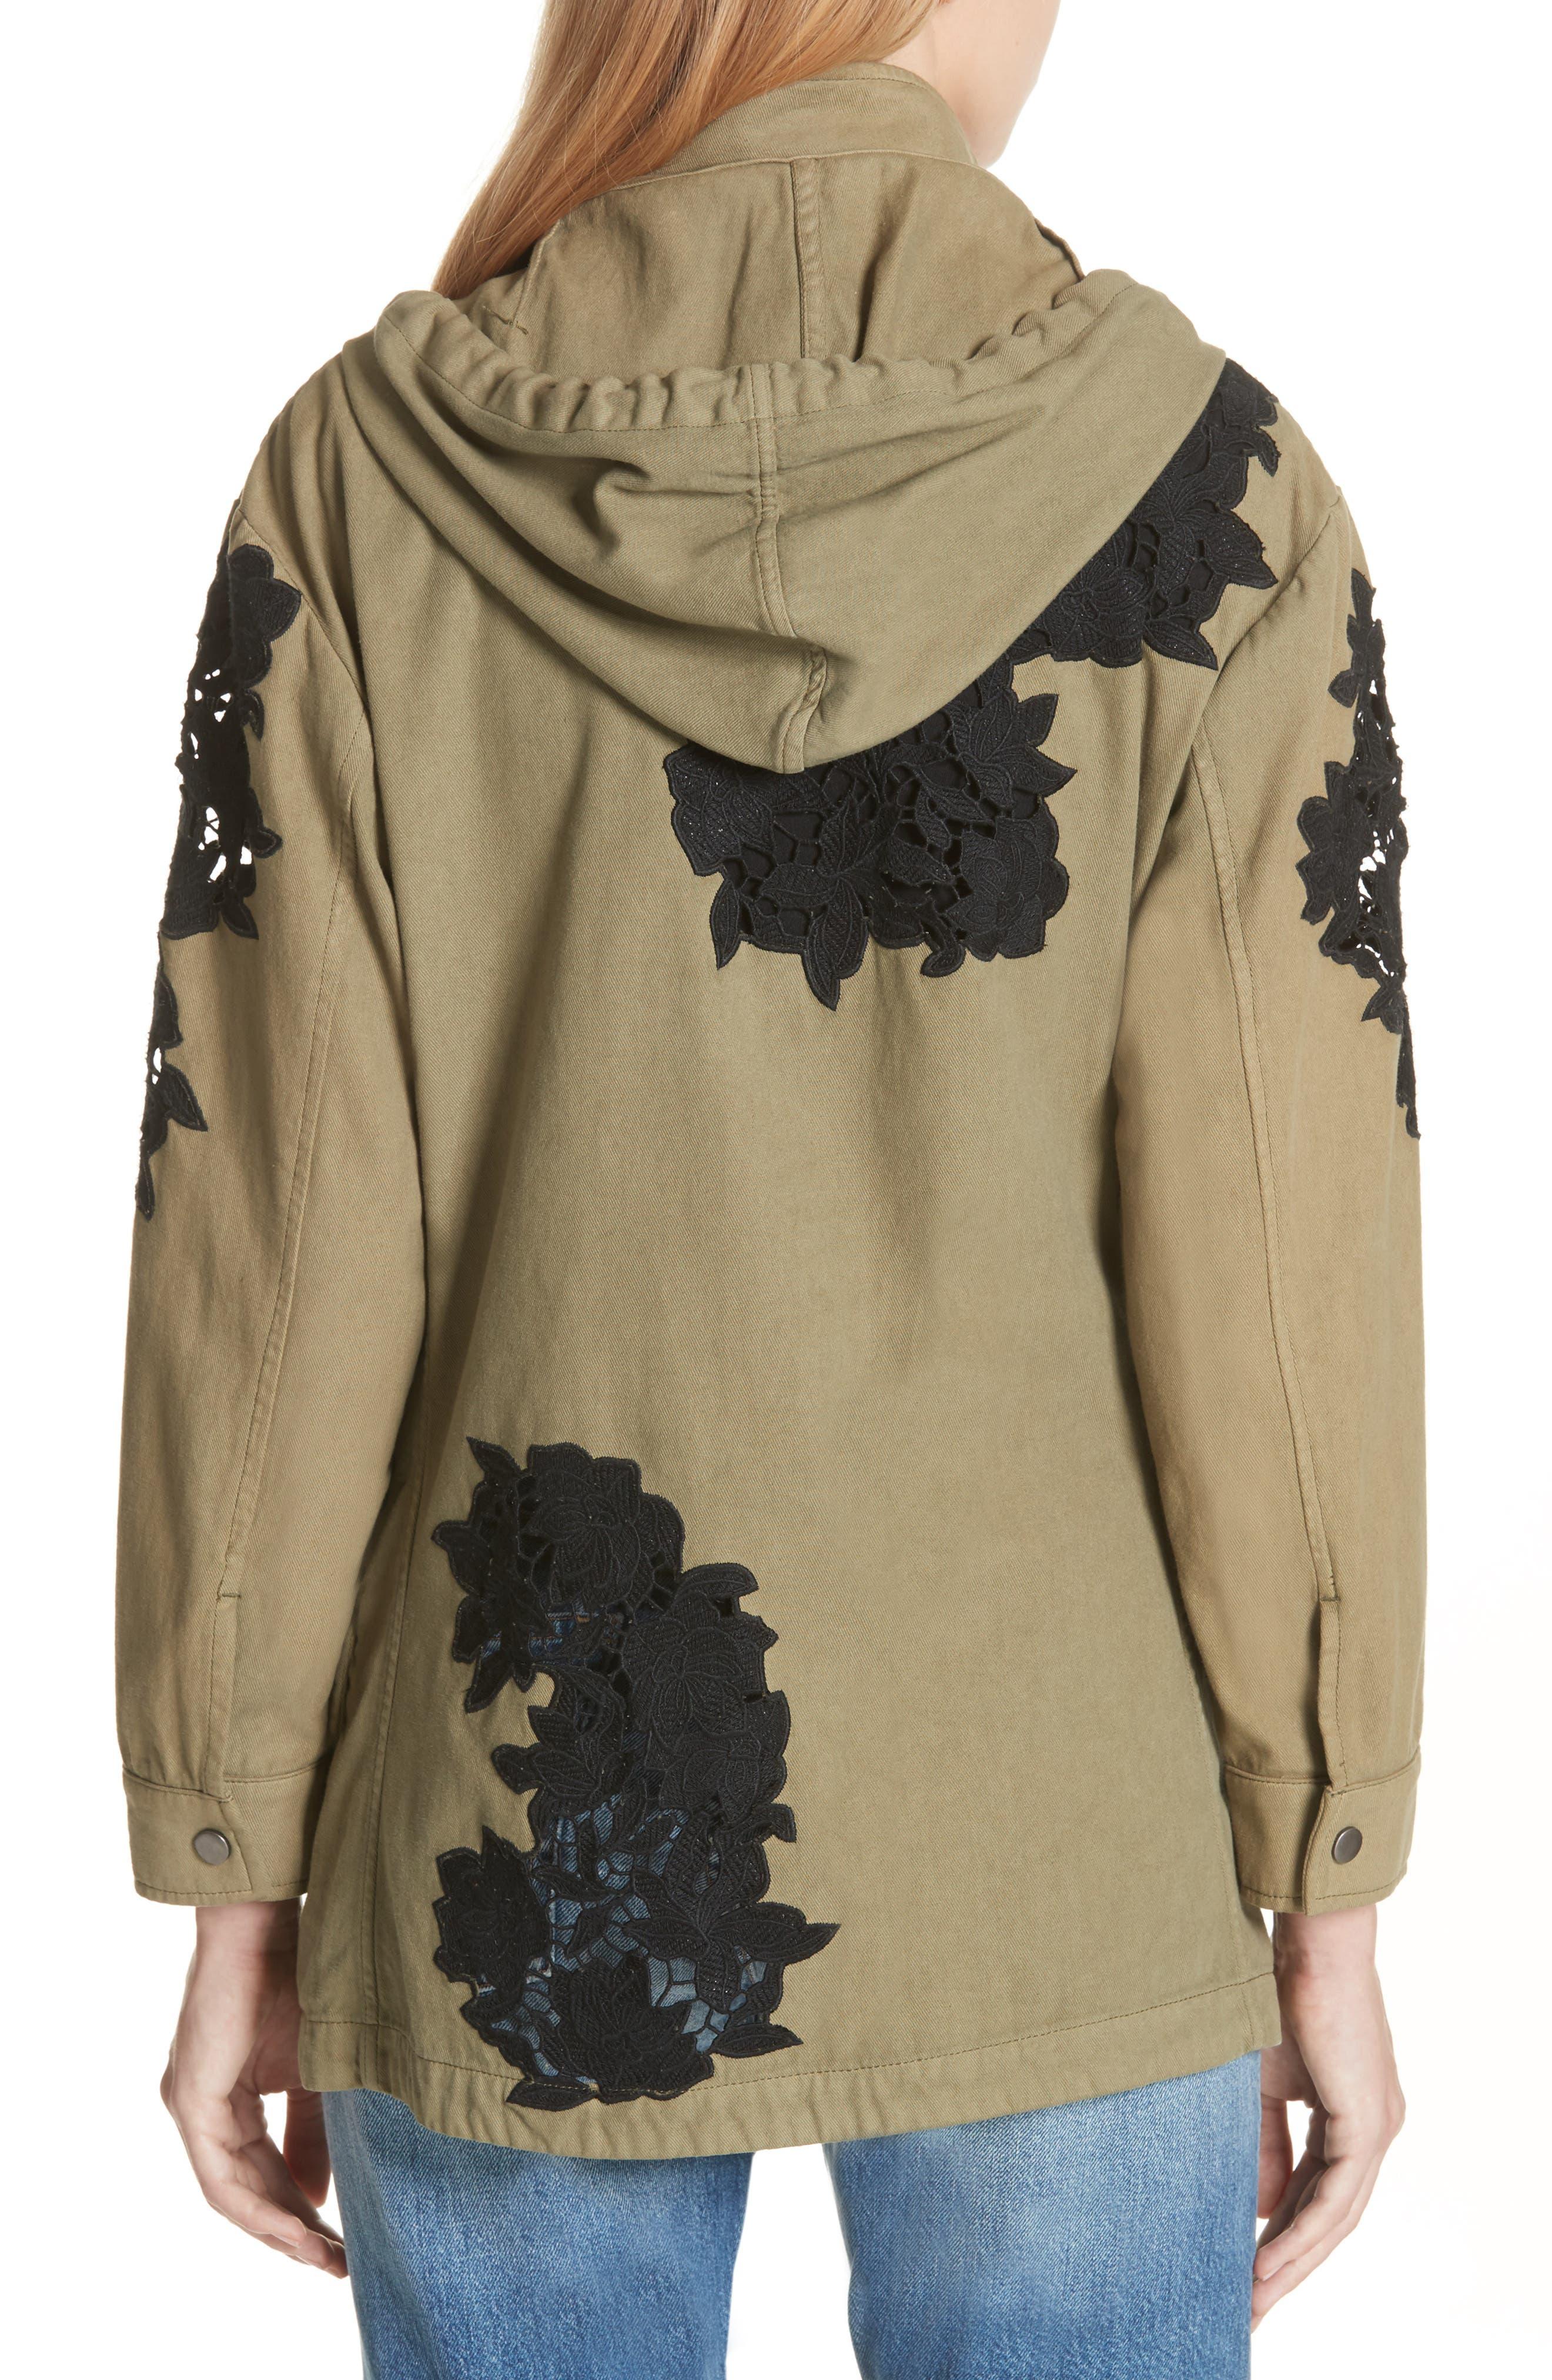 Meta Embroidered Utility Jacket,                             Alternate thumbnail 2, color,                             Olive/ Black